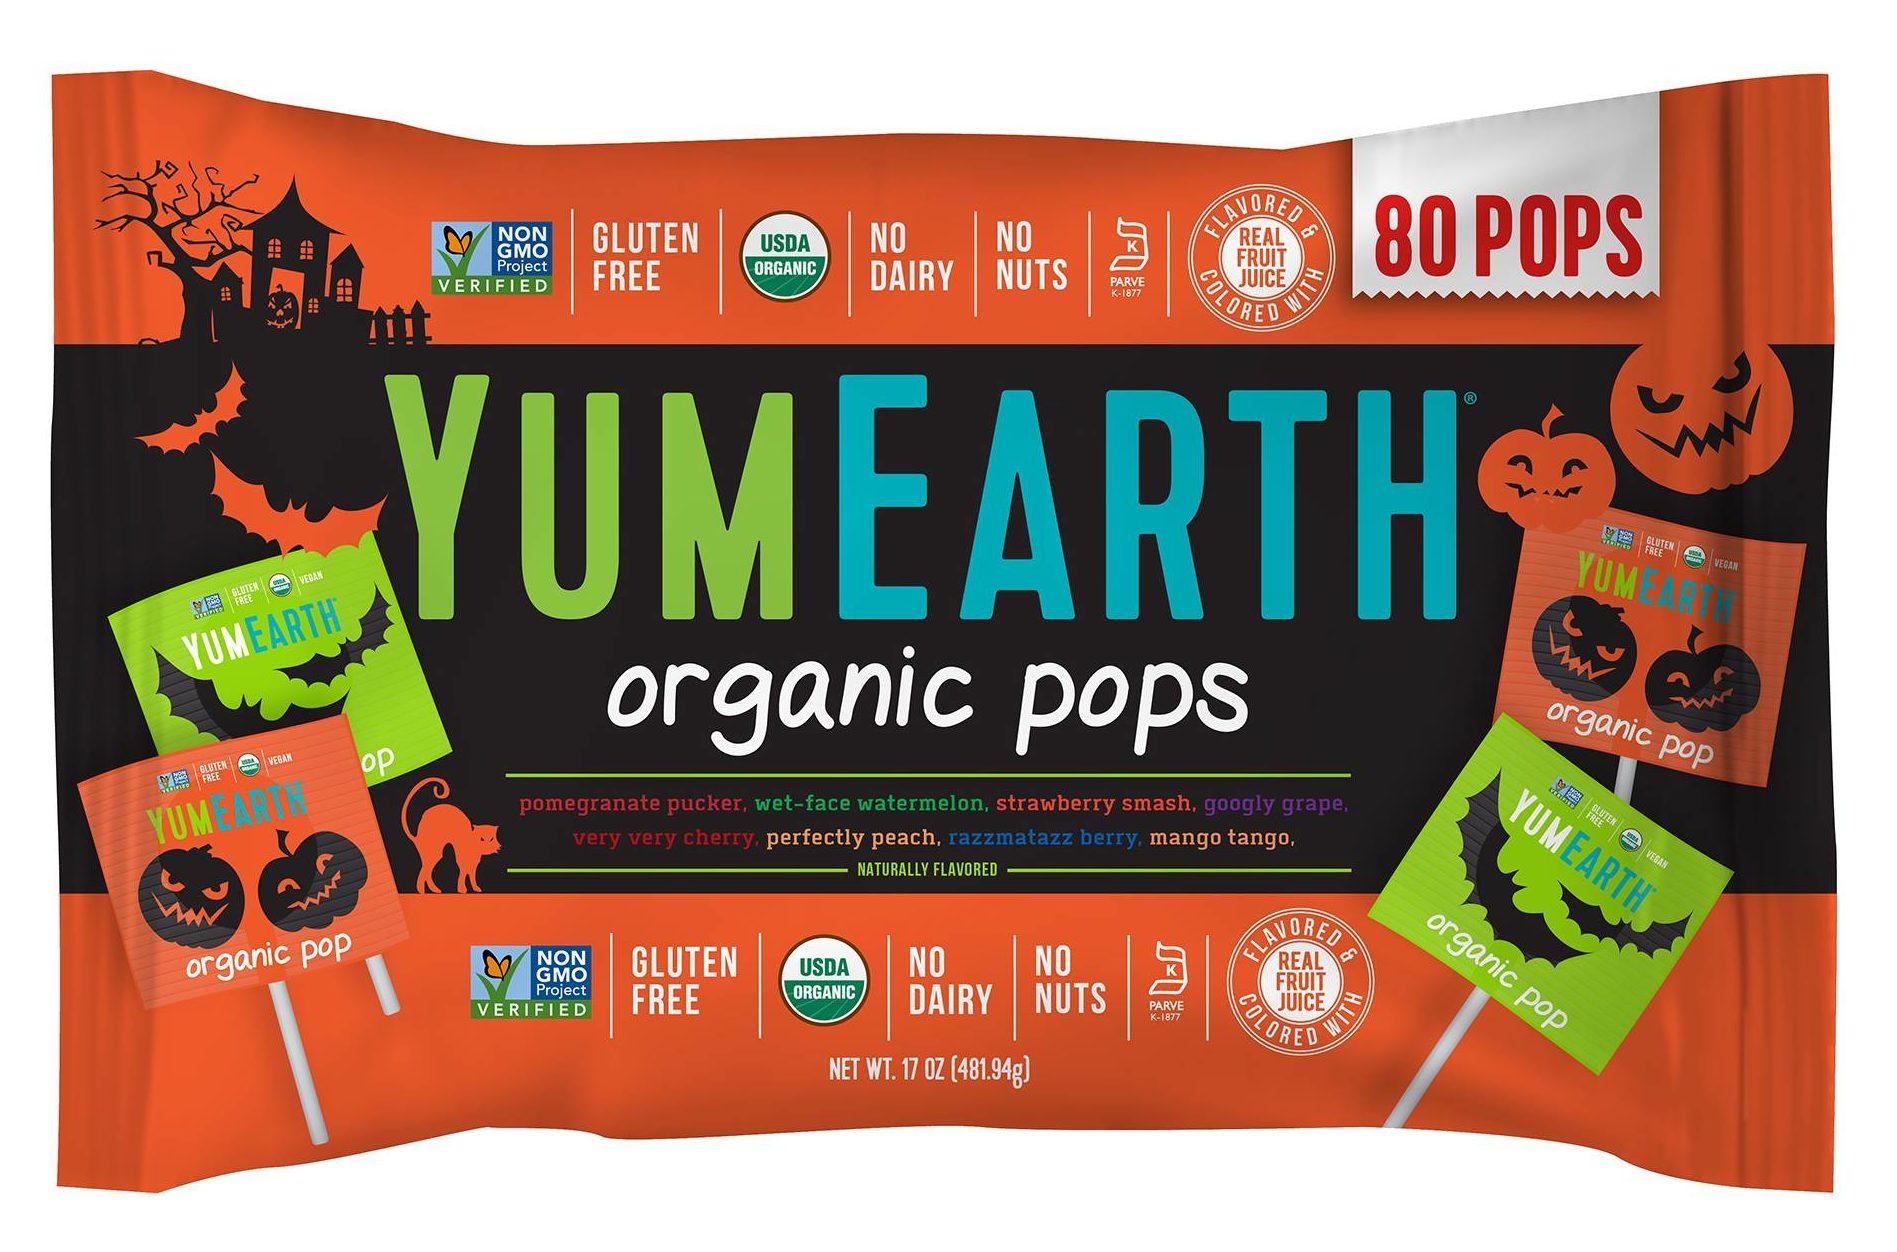 YumEarth Organic Pops | smelltheroses.com